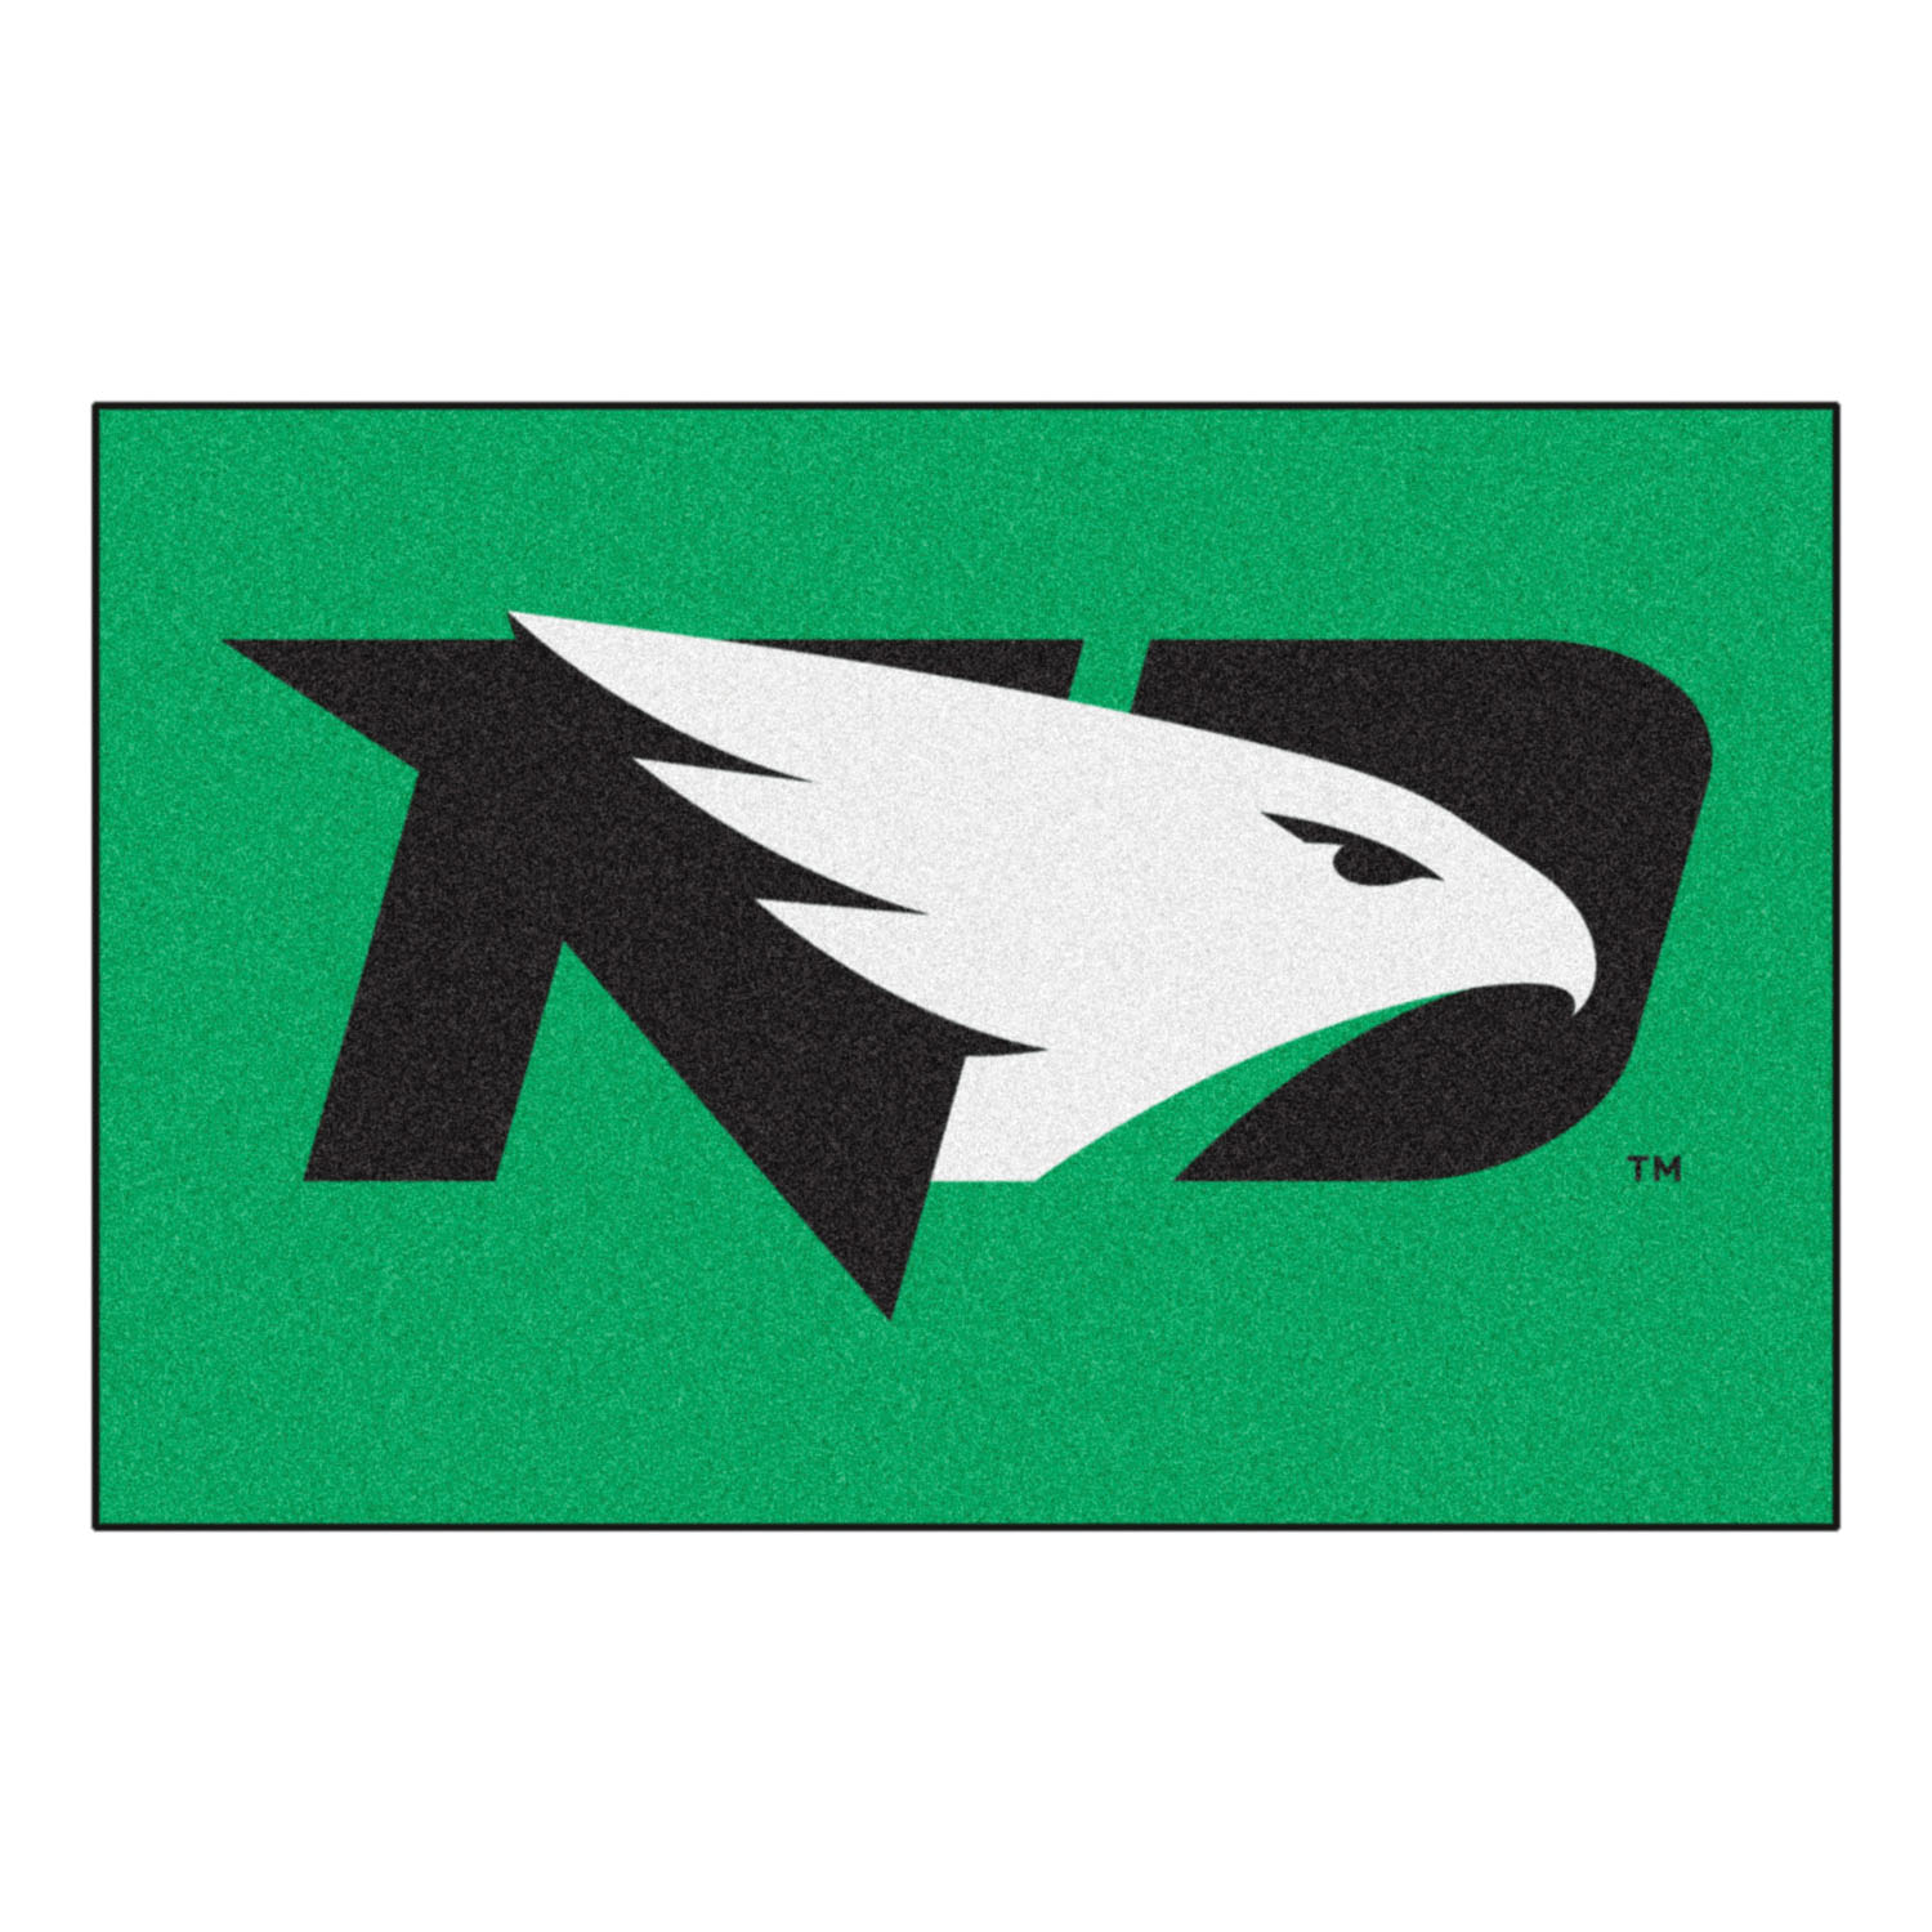 "Fanmats Ncaa North Dakota College Sports Team Logo Home Office Nylon Carpet Decorative Door Welcome Starter Rug Floor Mat 20""x30"" at Sears.com"